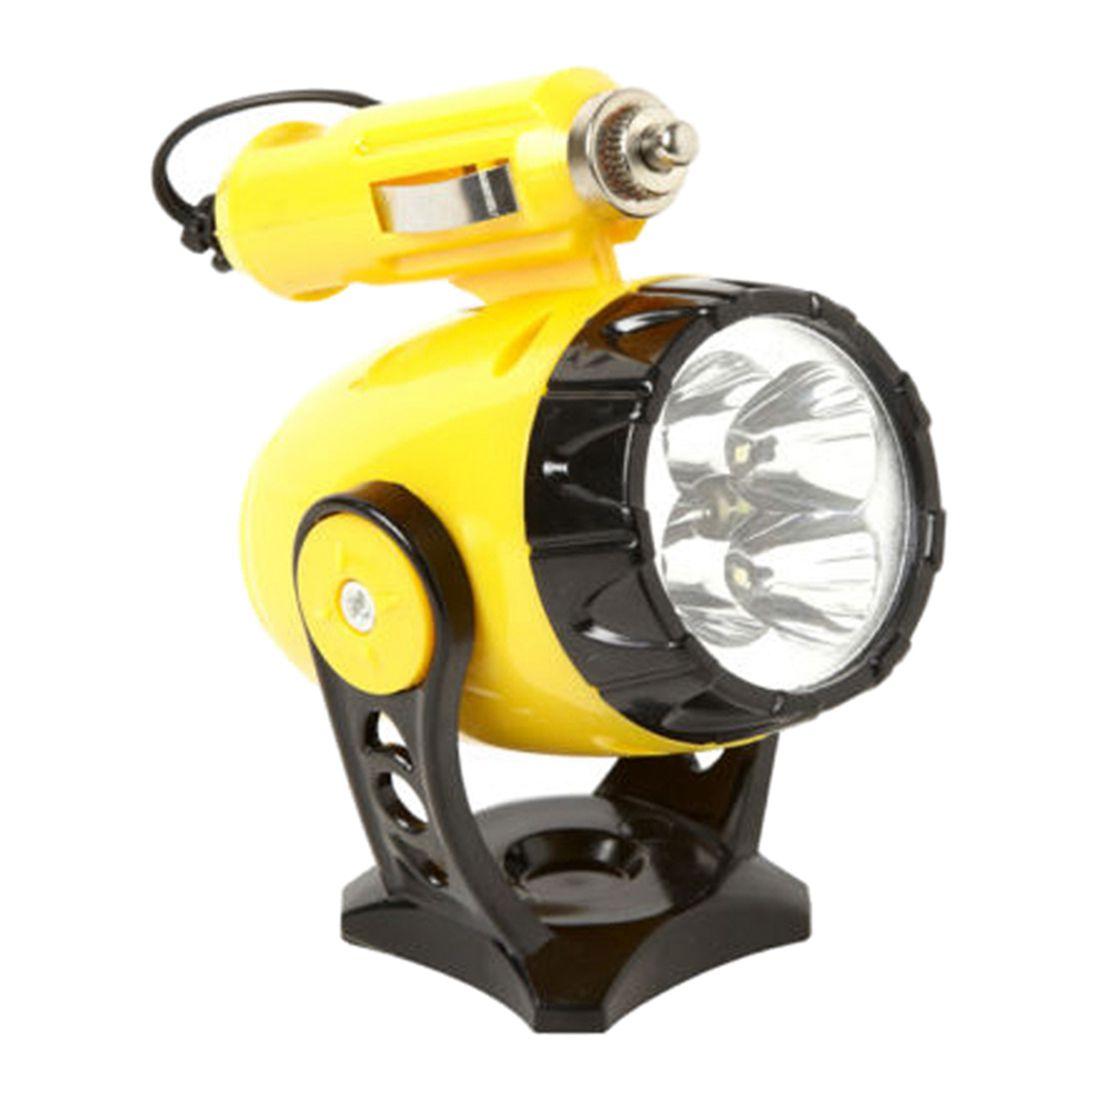 12V 5 LED Flashlight Car Auto Cigarette Lighter Magnetic Emergency Work Light LED Magnetic Working Lights Emergency Flashlights стоимость